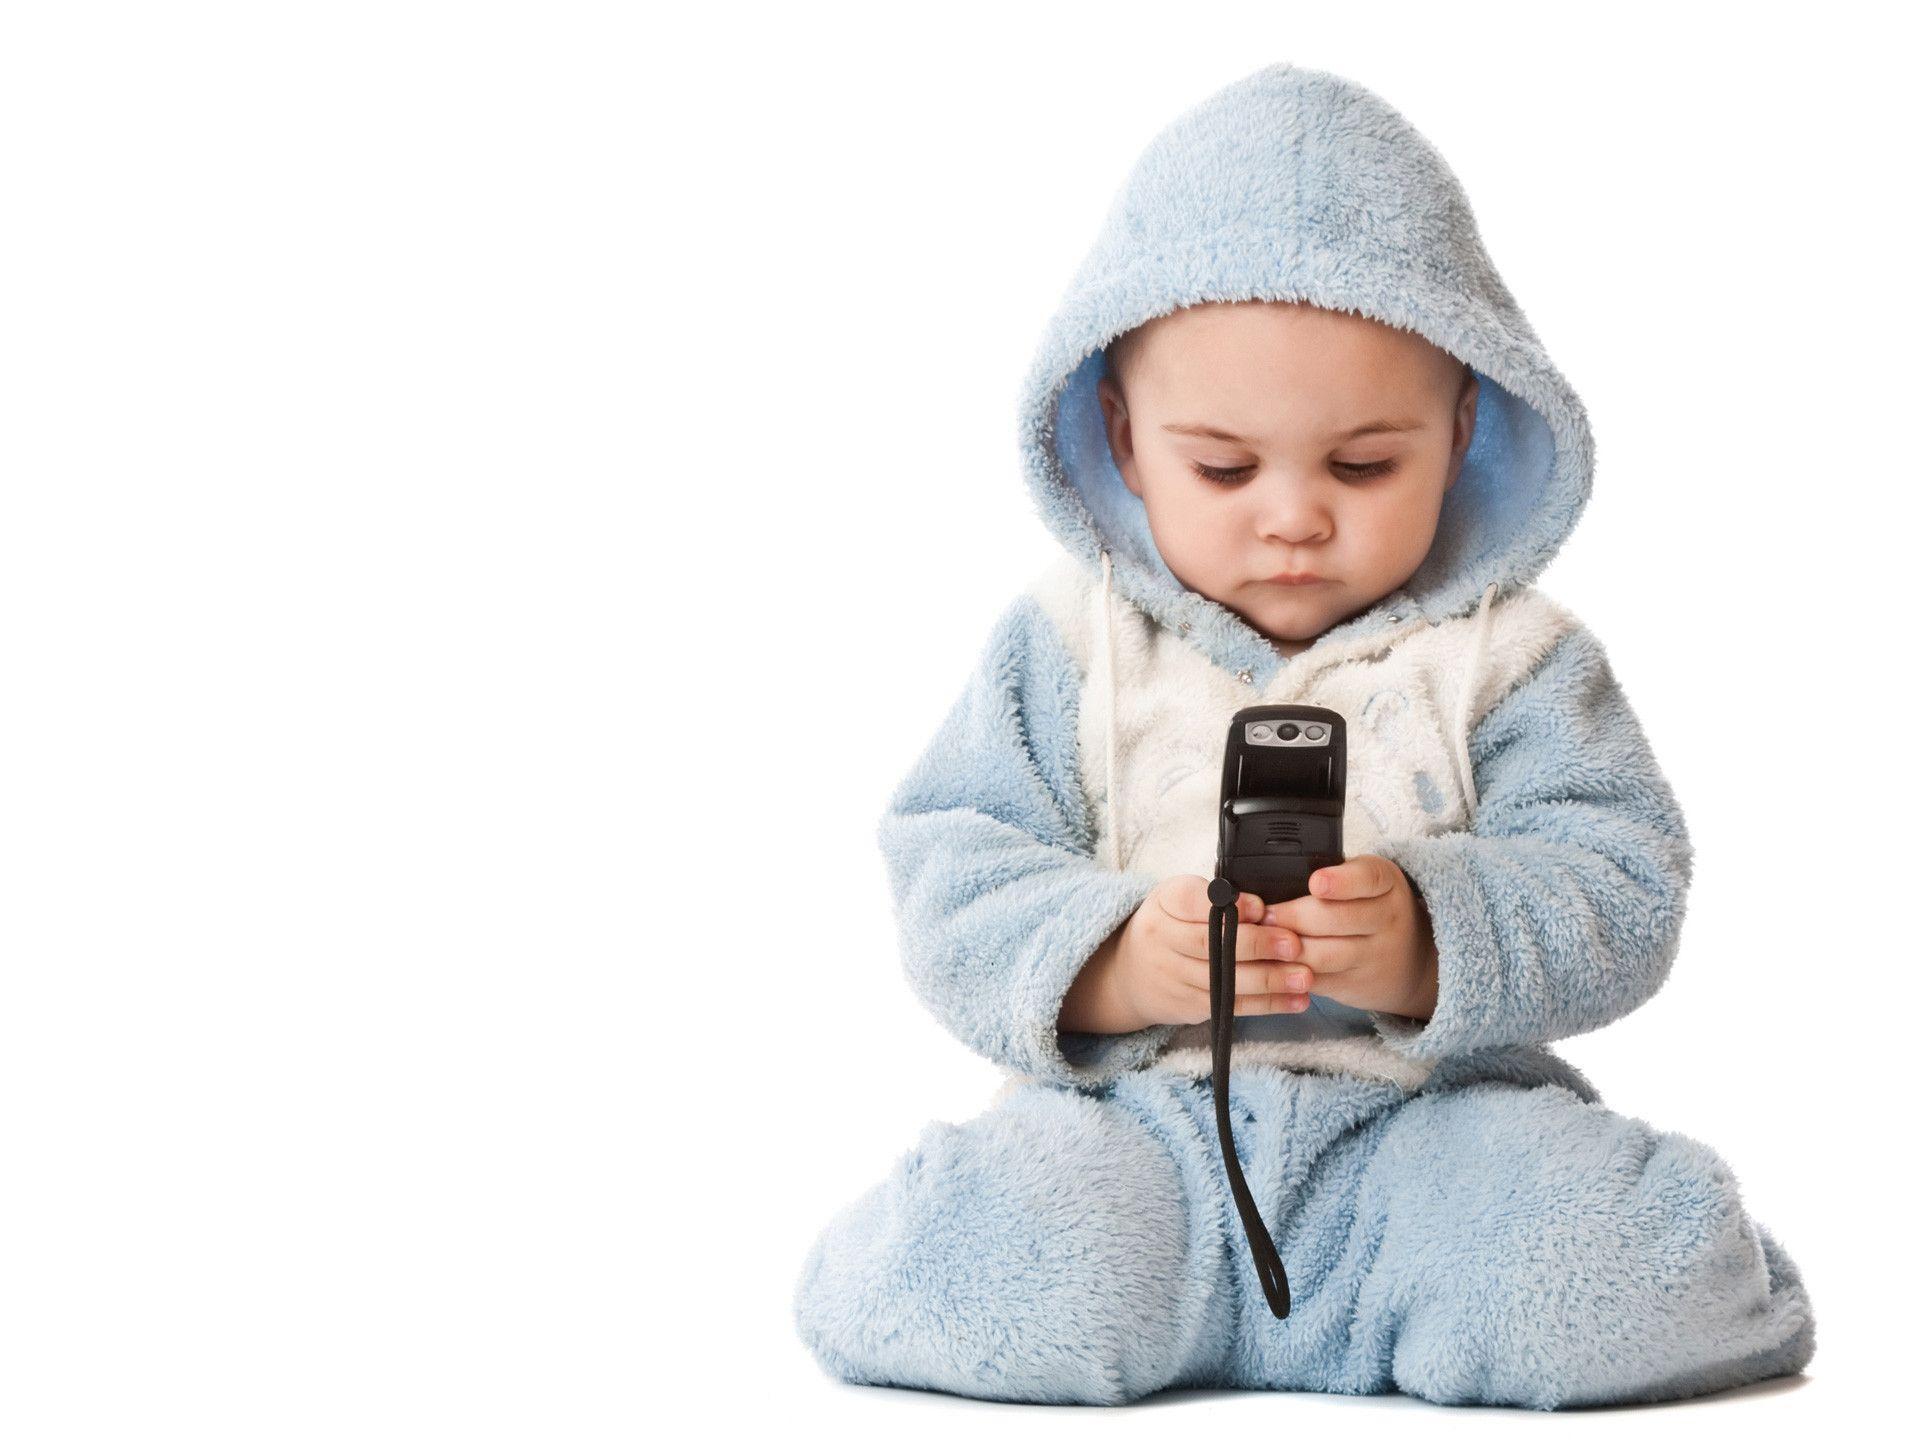 Cute boy hd wallpaper - Cute Baby Boy Mobile Wallpapers Hd Wallpapers